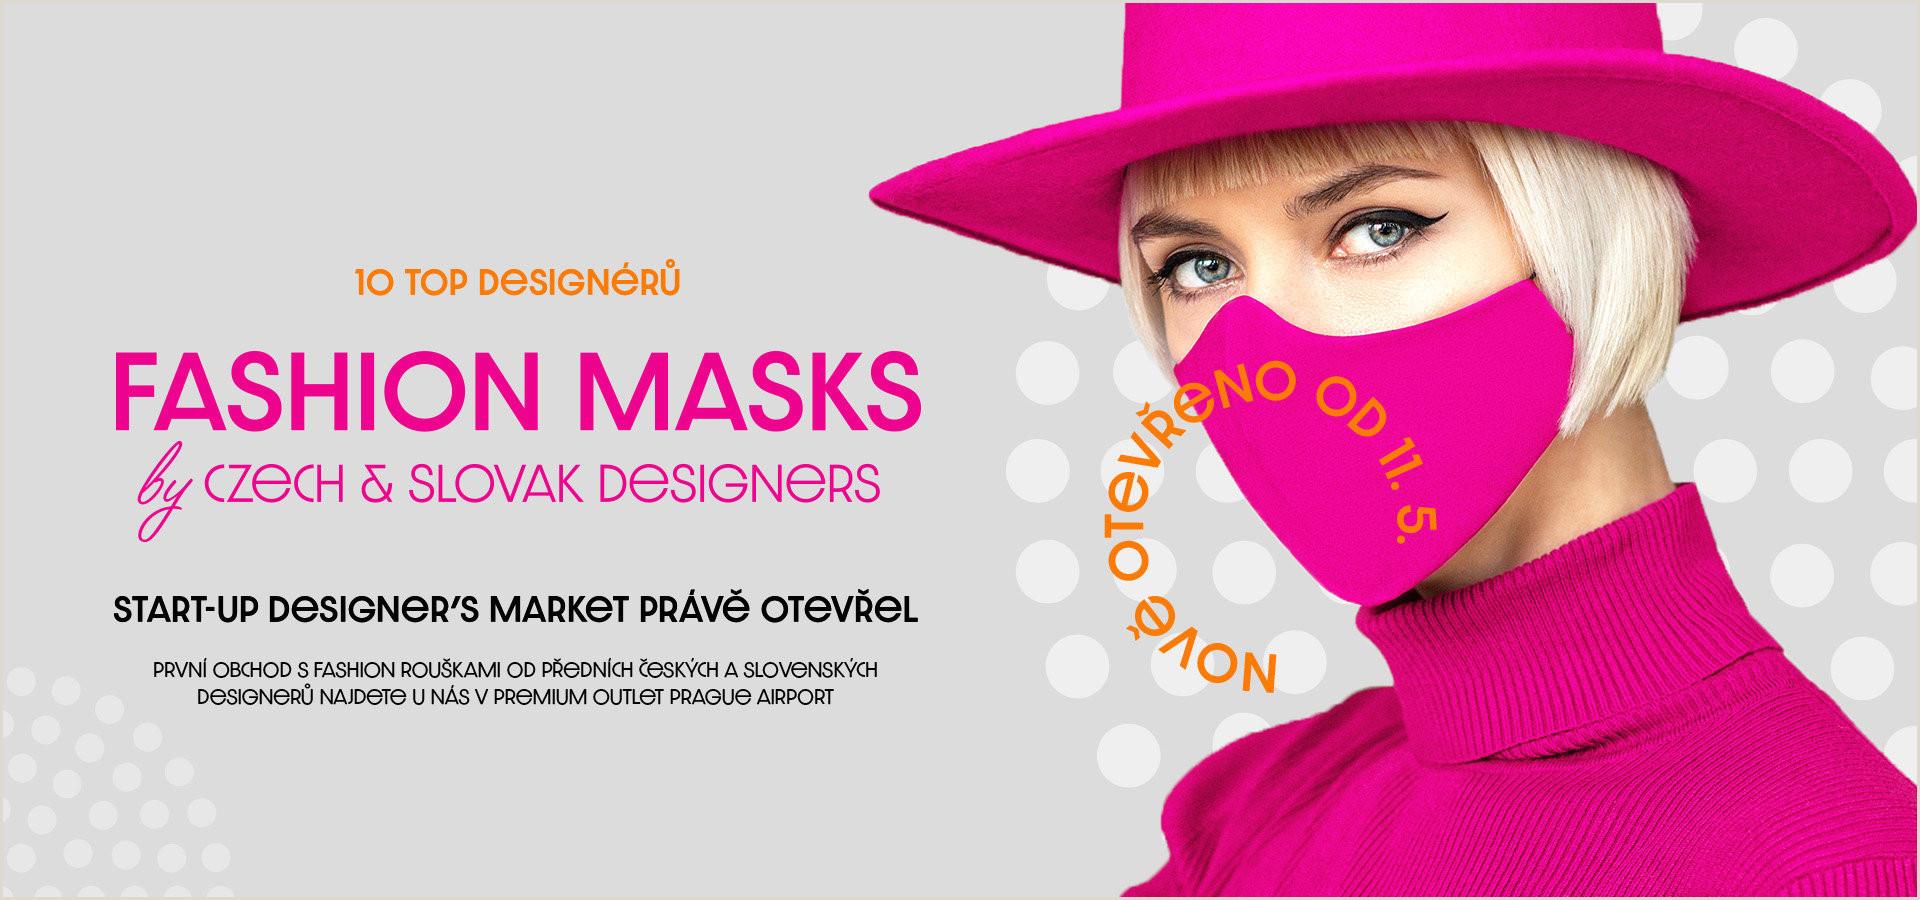 Banner Pop Up Fashion Masks By Czech & Slovak Designers Start Up